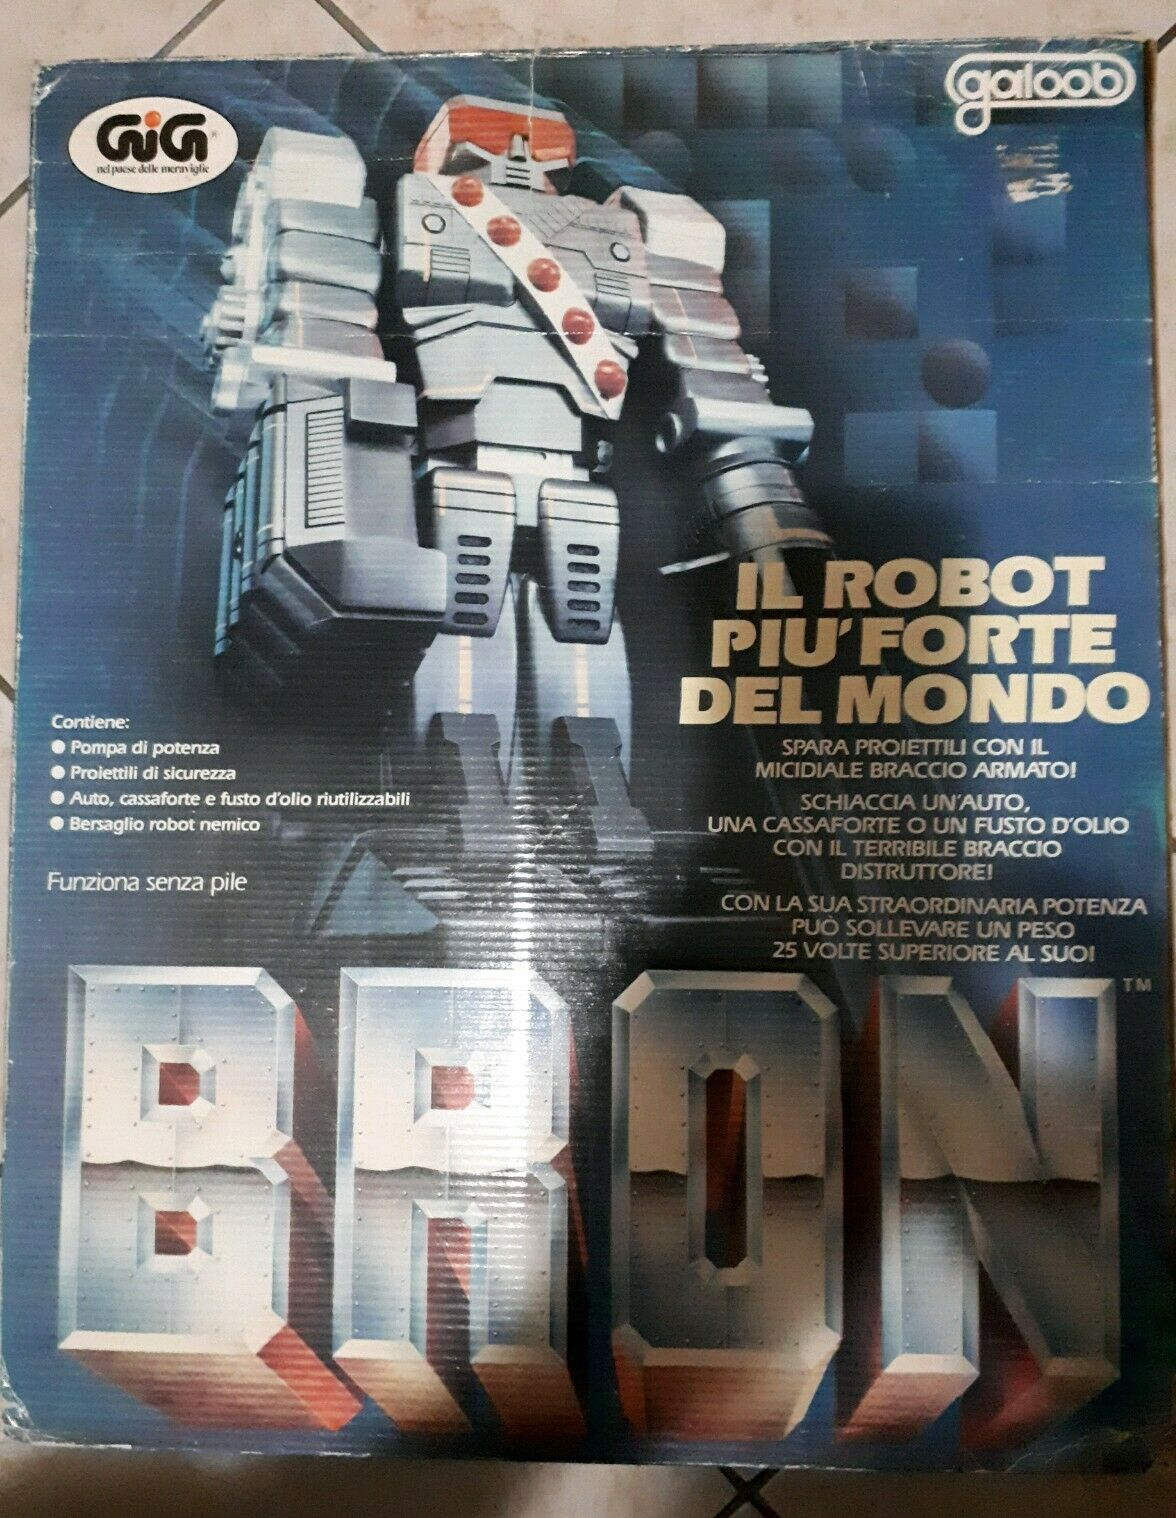 BRON il robot più forte del mondo 1984 GIG Galoob vintage Mattel